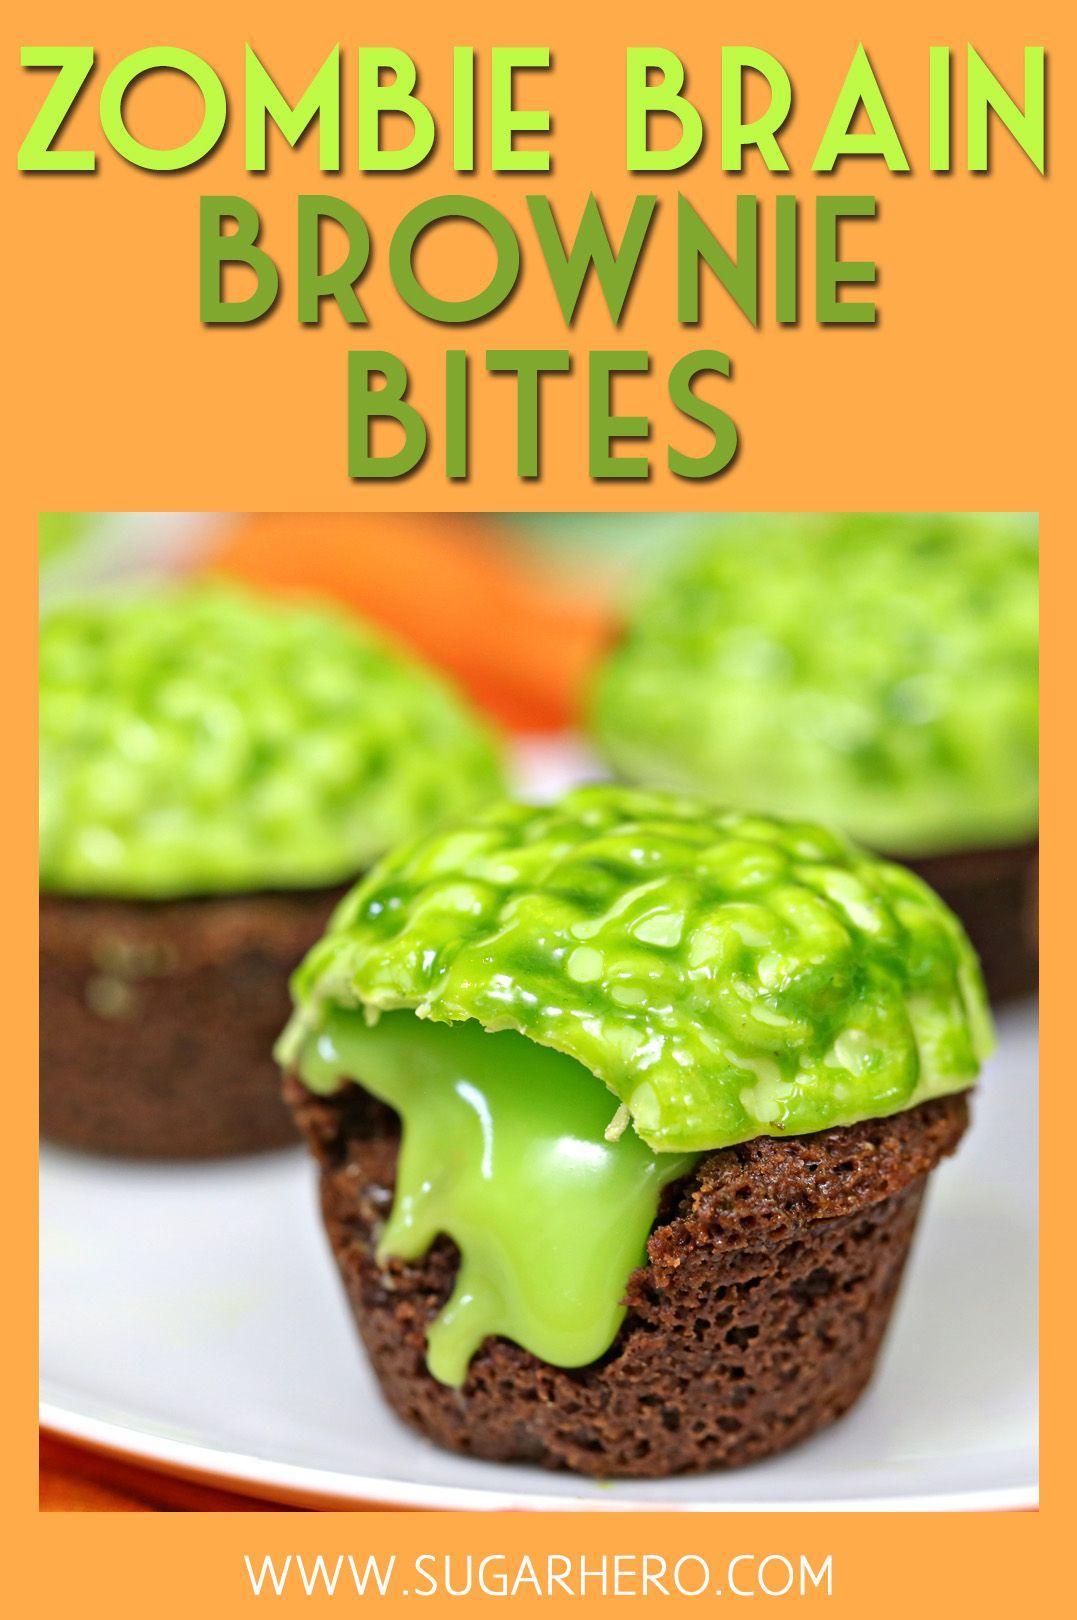 Zombie Brain Brownie Bites Video #foodrecipies